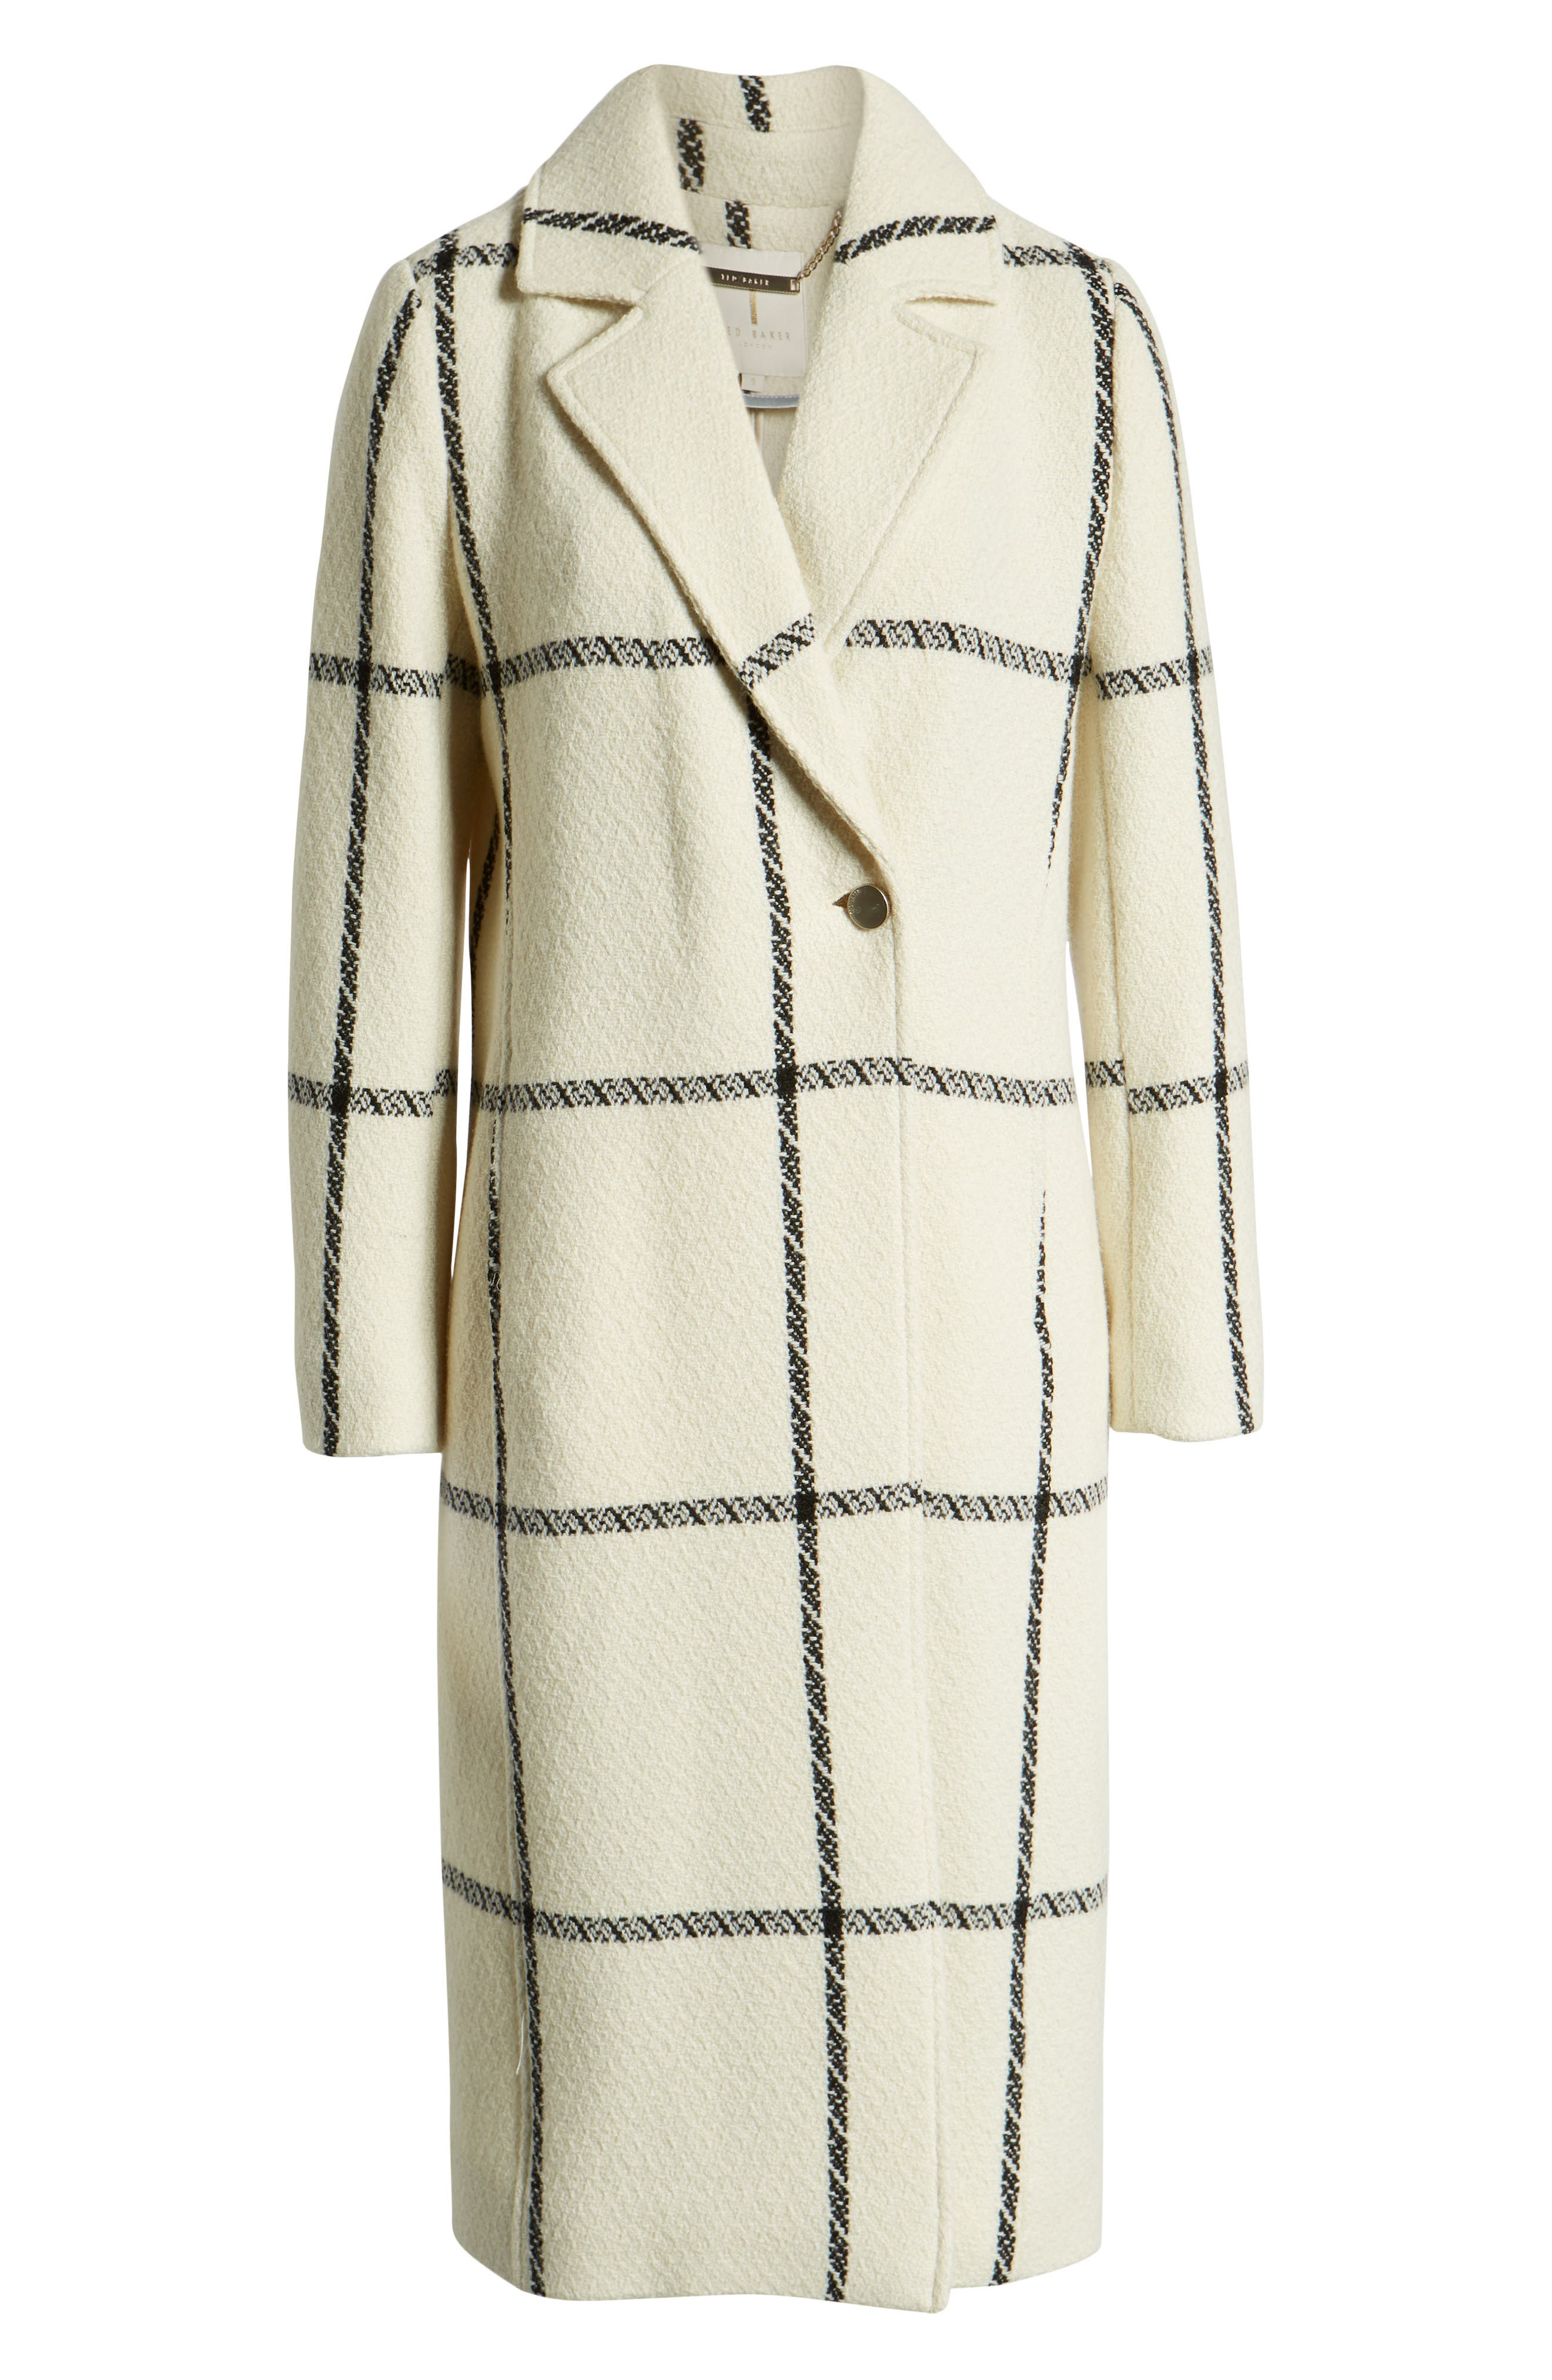 TED BAKER LONDON,                             Soniq Check Wool Blend Long Coat,                             Alternate thumbnail 6, color,                             92-IVORY